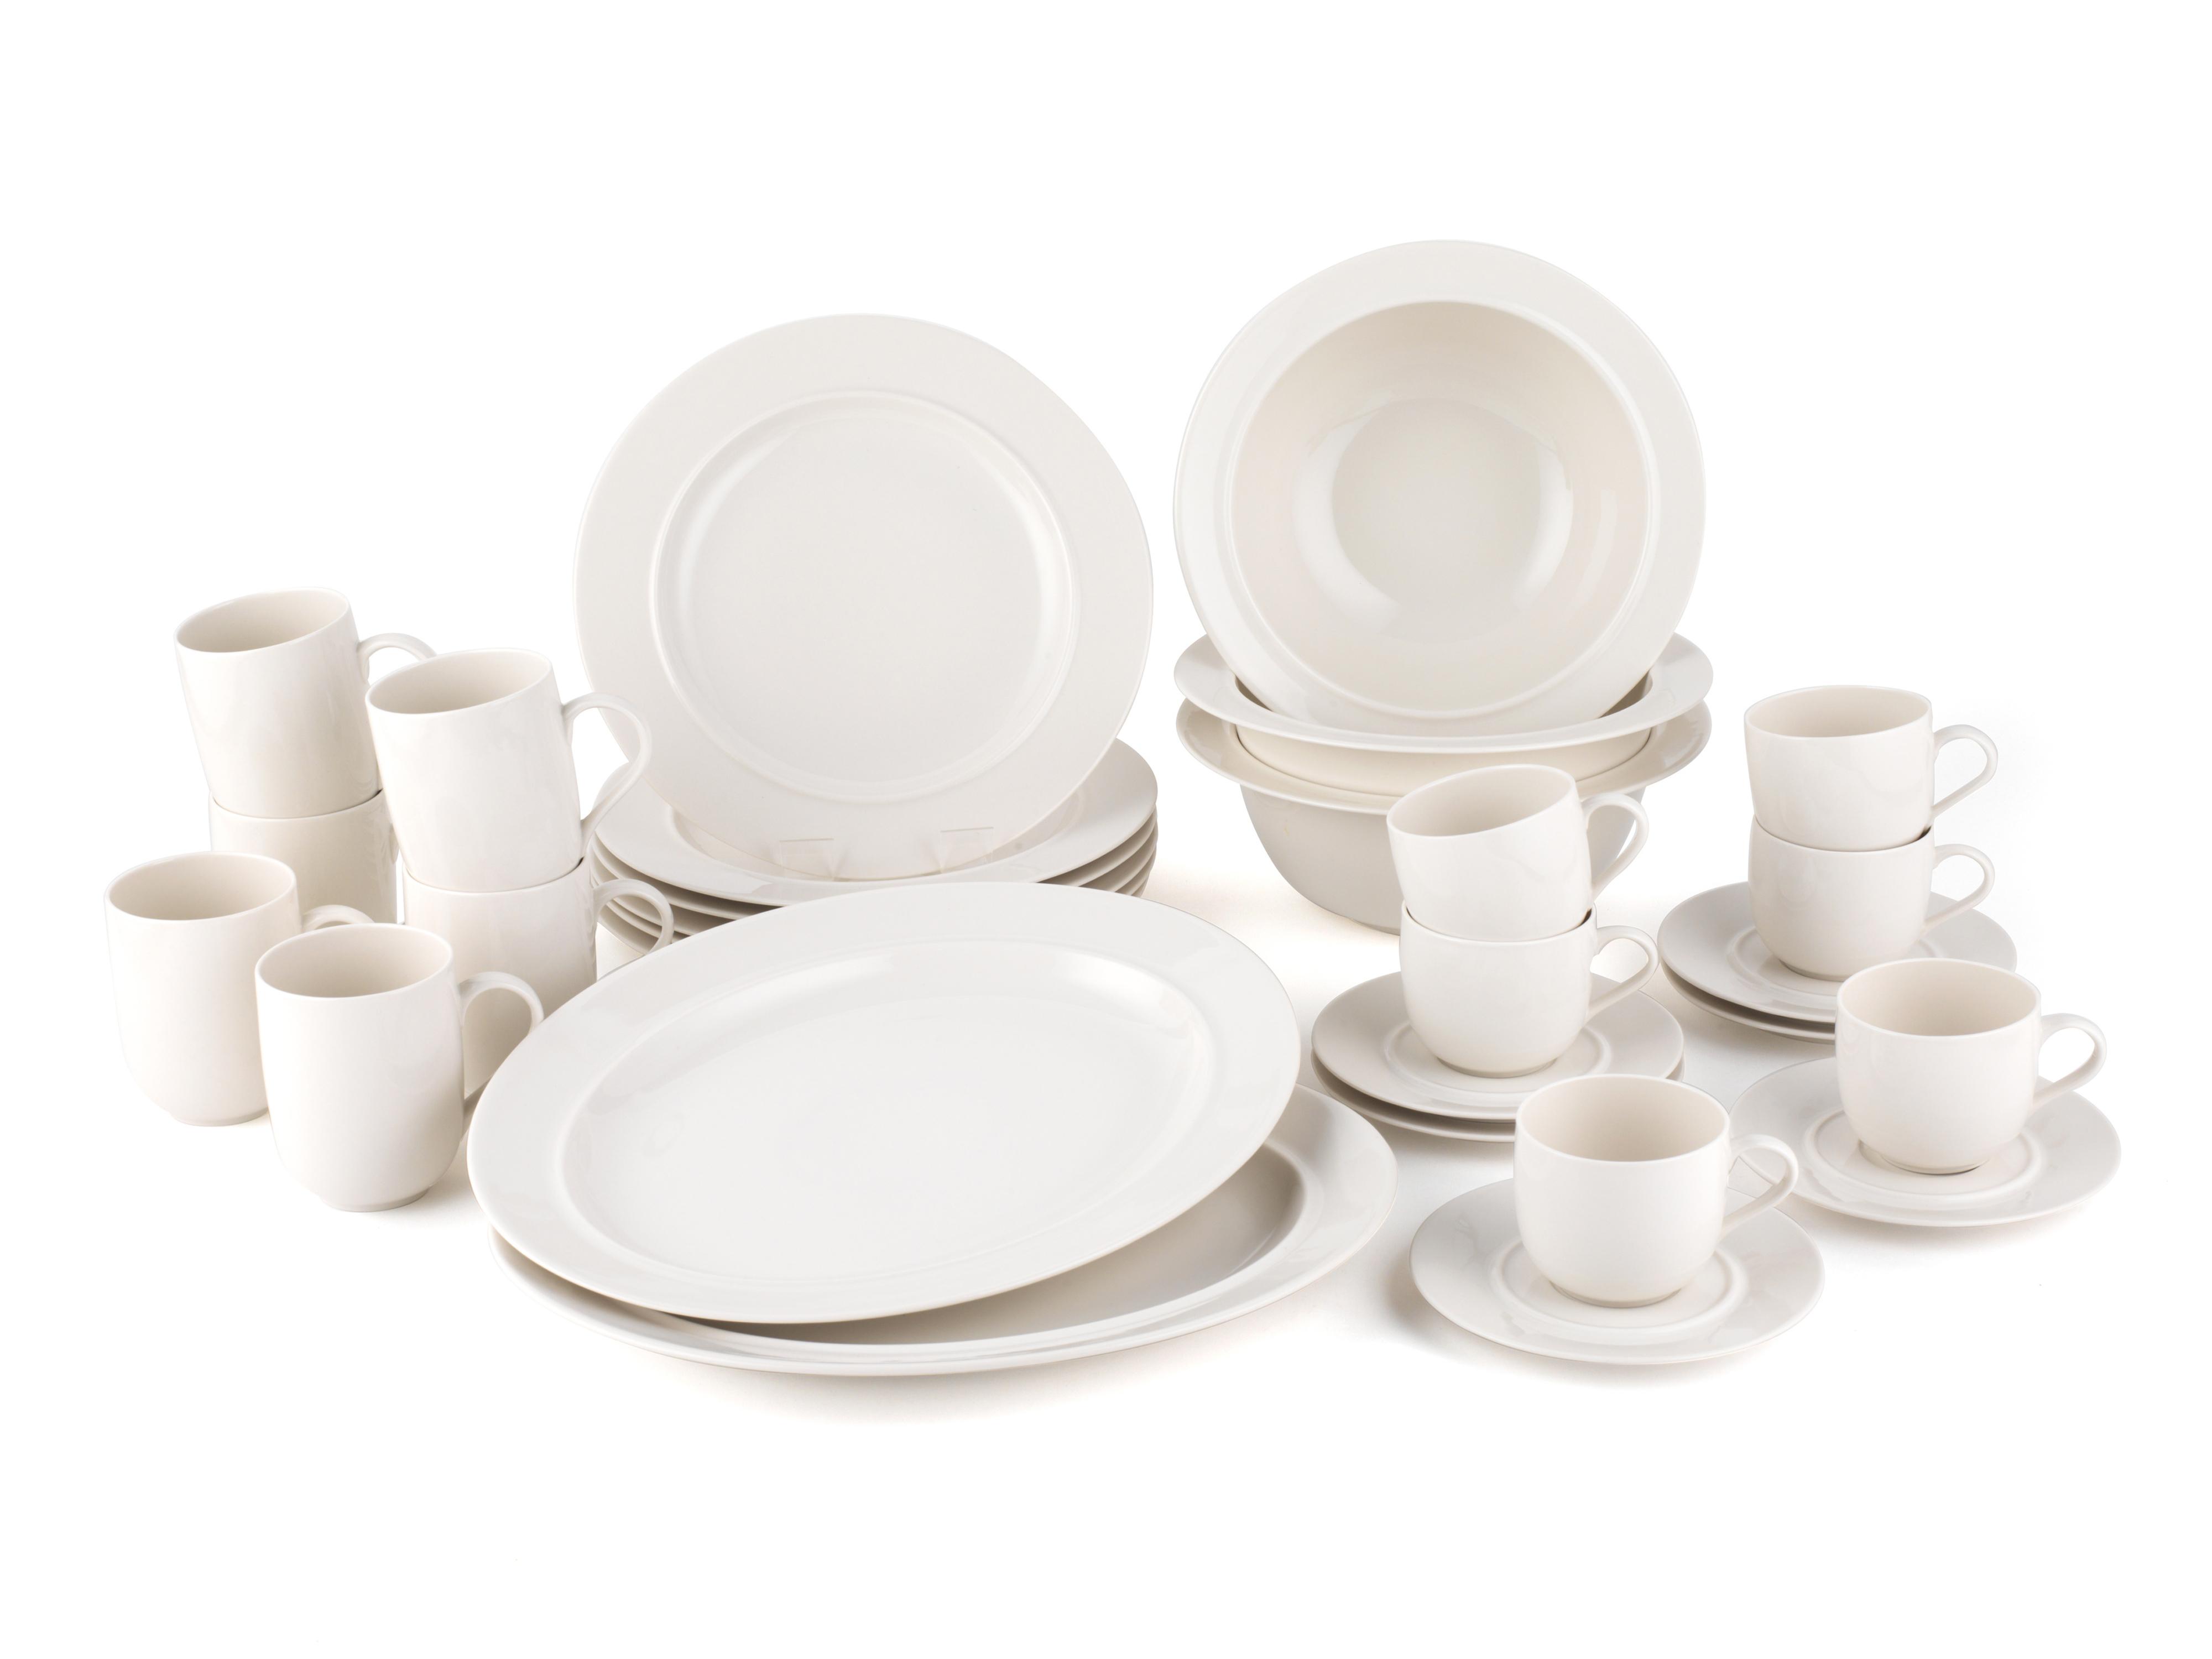 Alessi La Bella Tavola Porcelain 6-Place Setting Dining Set with 3 Serving Bowls \u0026  sc 1 st  No1Brands4You & Alessi La Bella Tavola Porcelain 6-Place Setting Dining Set with 3 ...